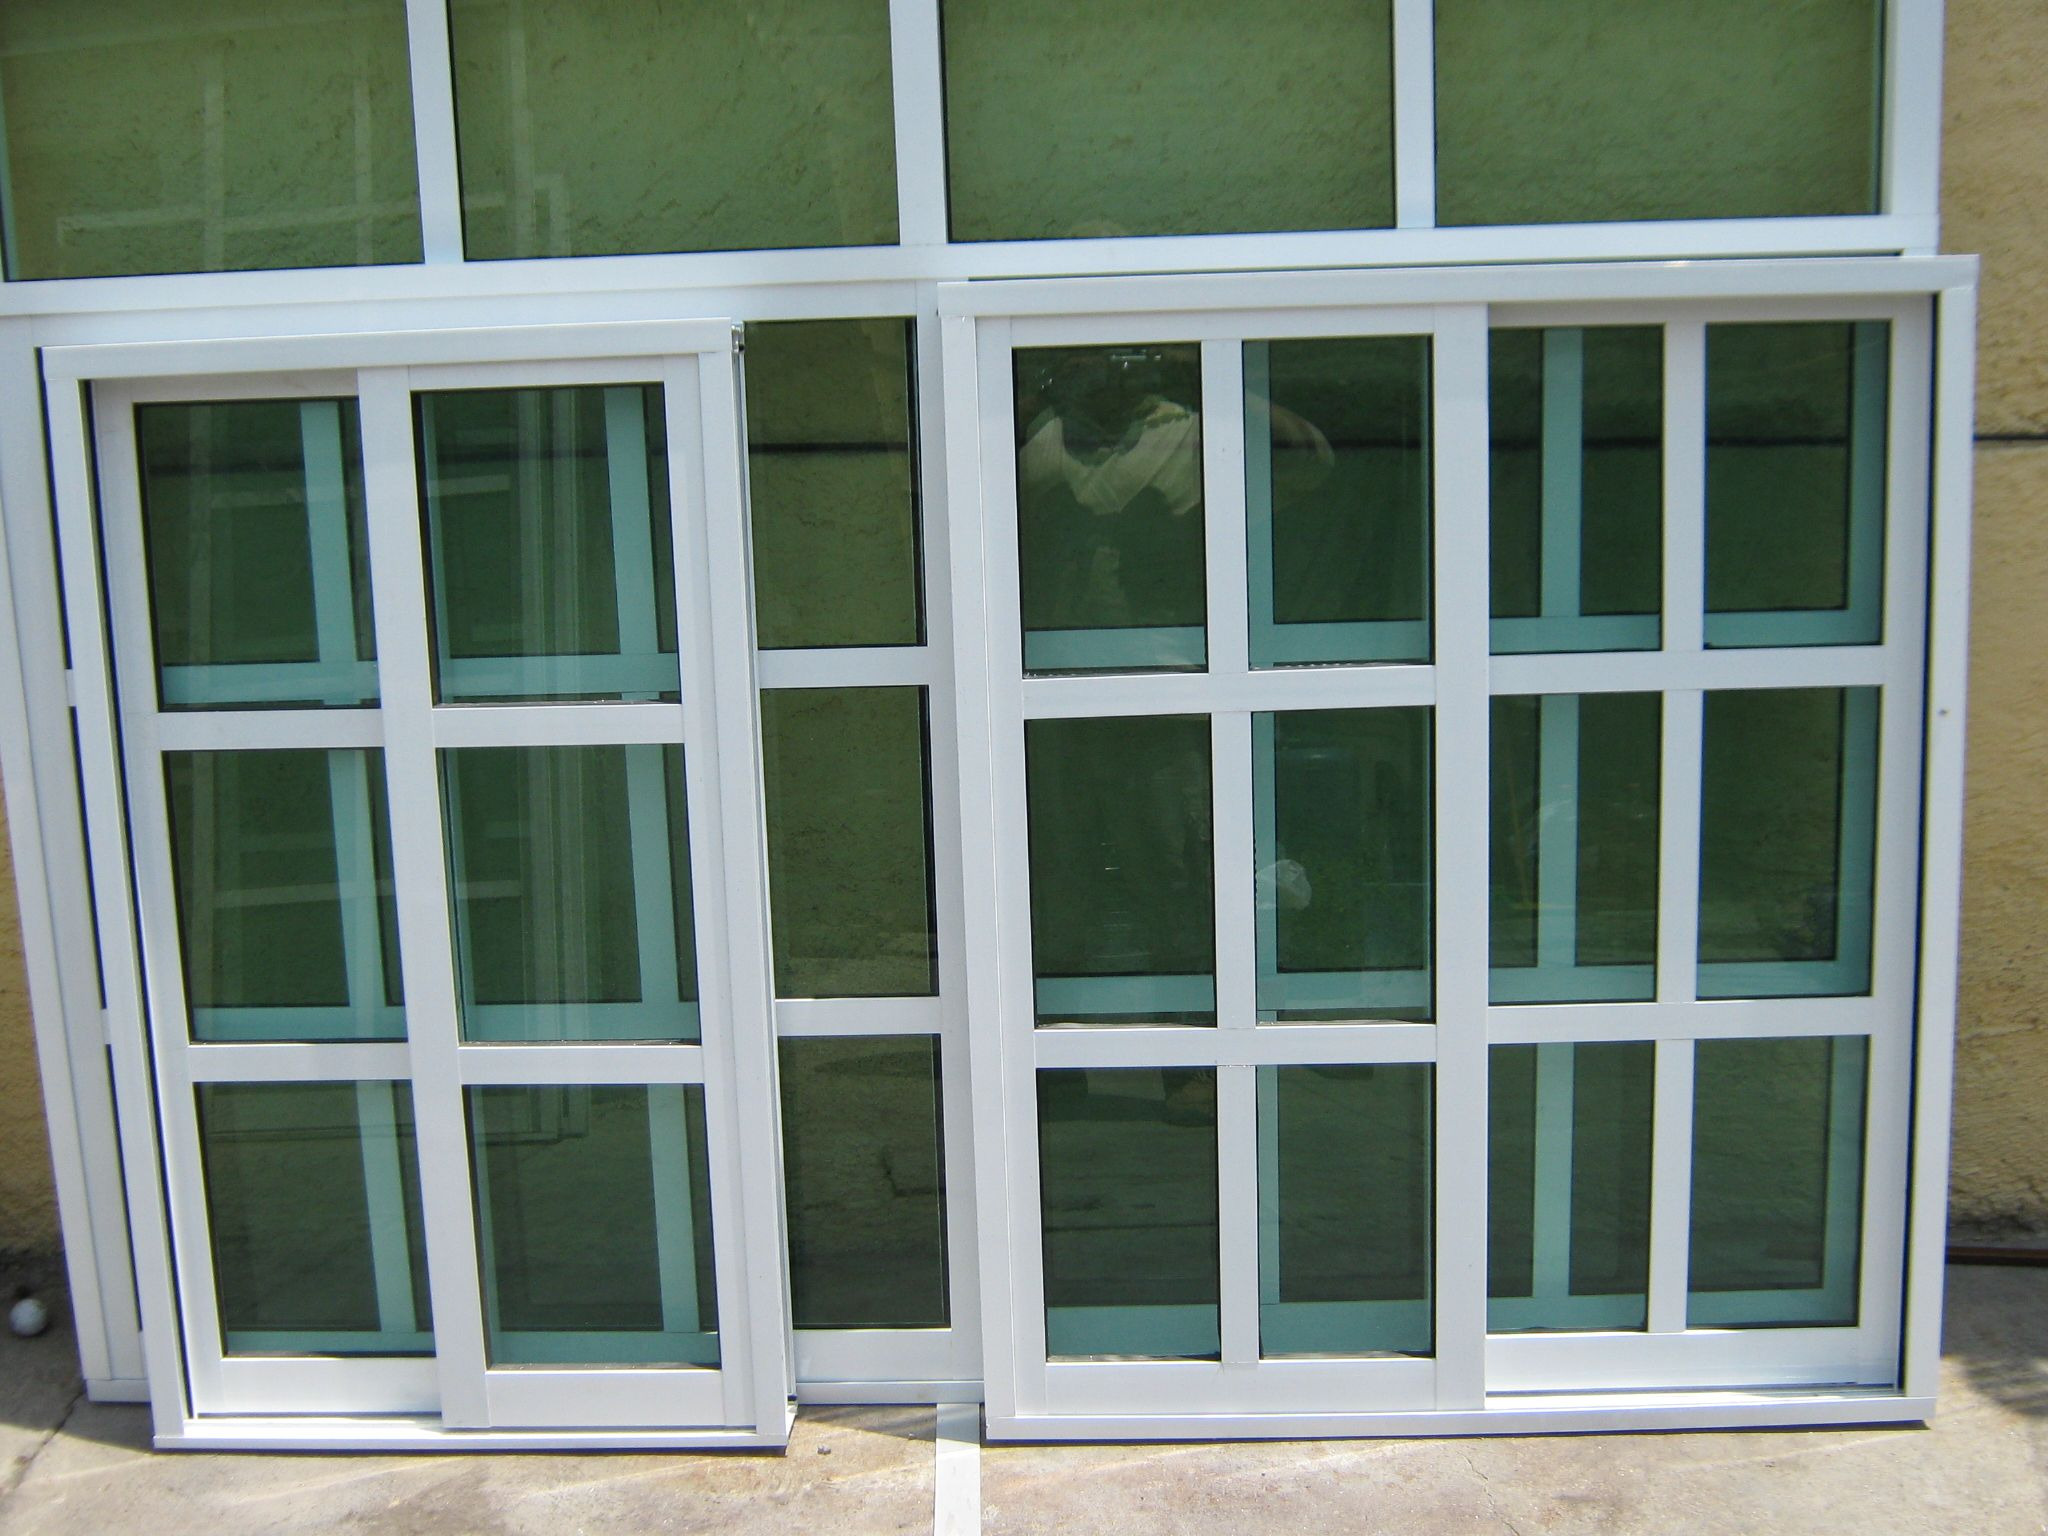 Ventanas de aluminio puertas ventanas de aluminio for Modelos de ventanas de aluminio para casas